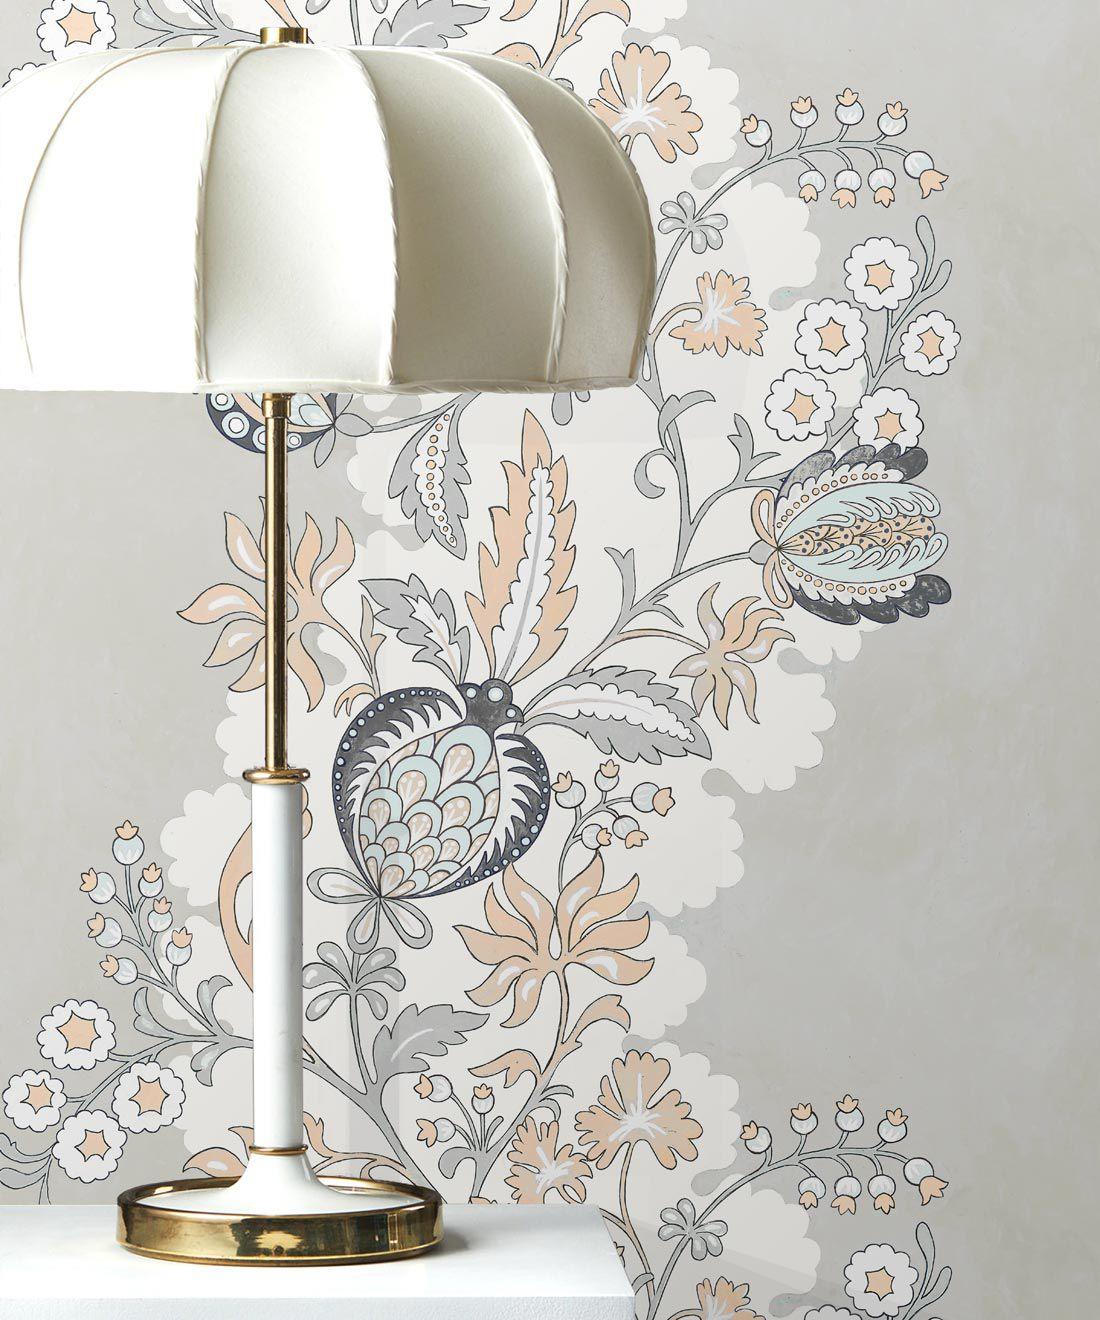 Pomegranate Wallpaper • salmon • insitu with lamp